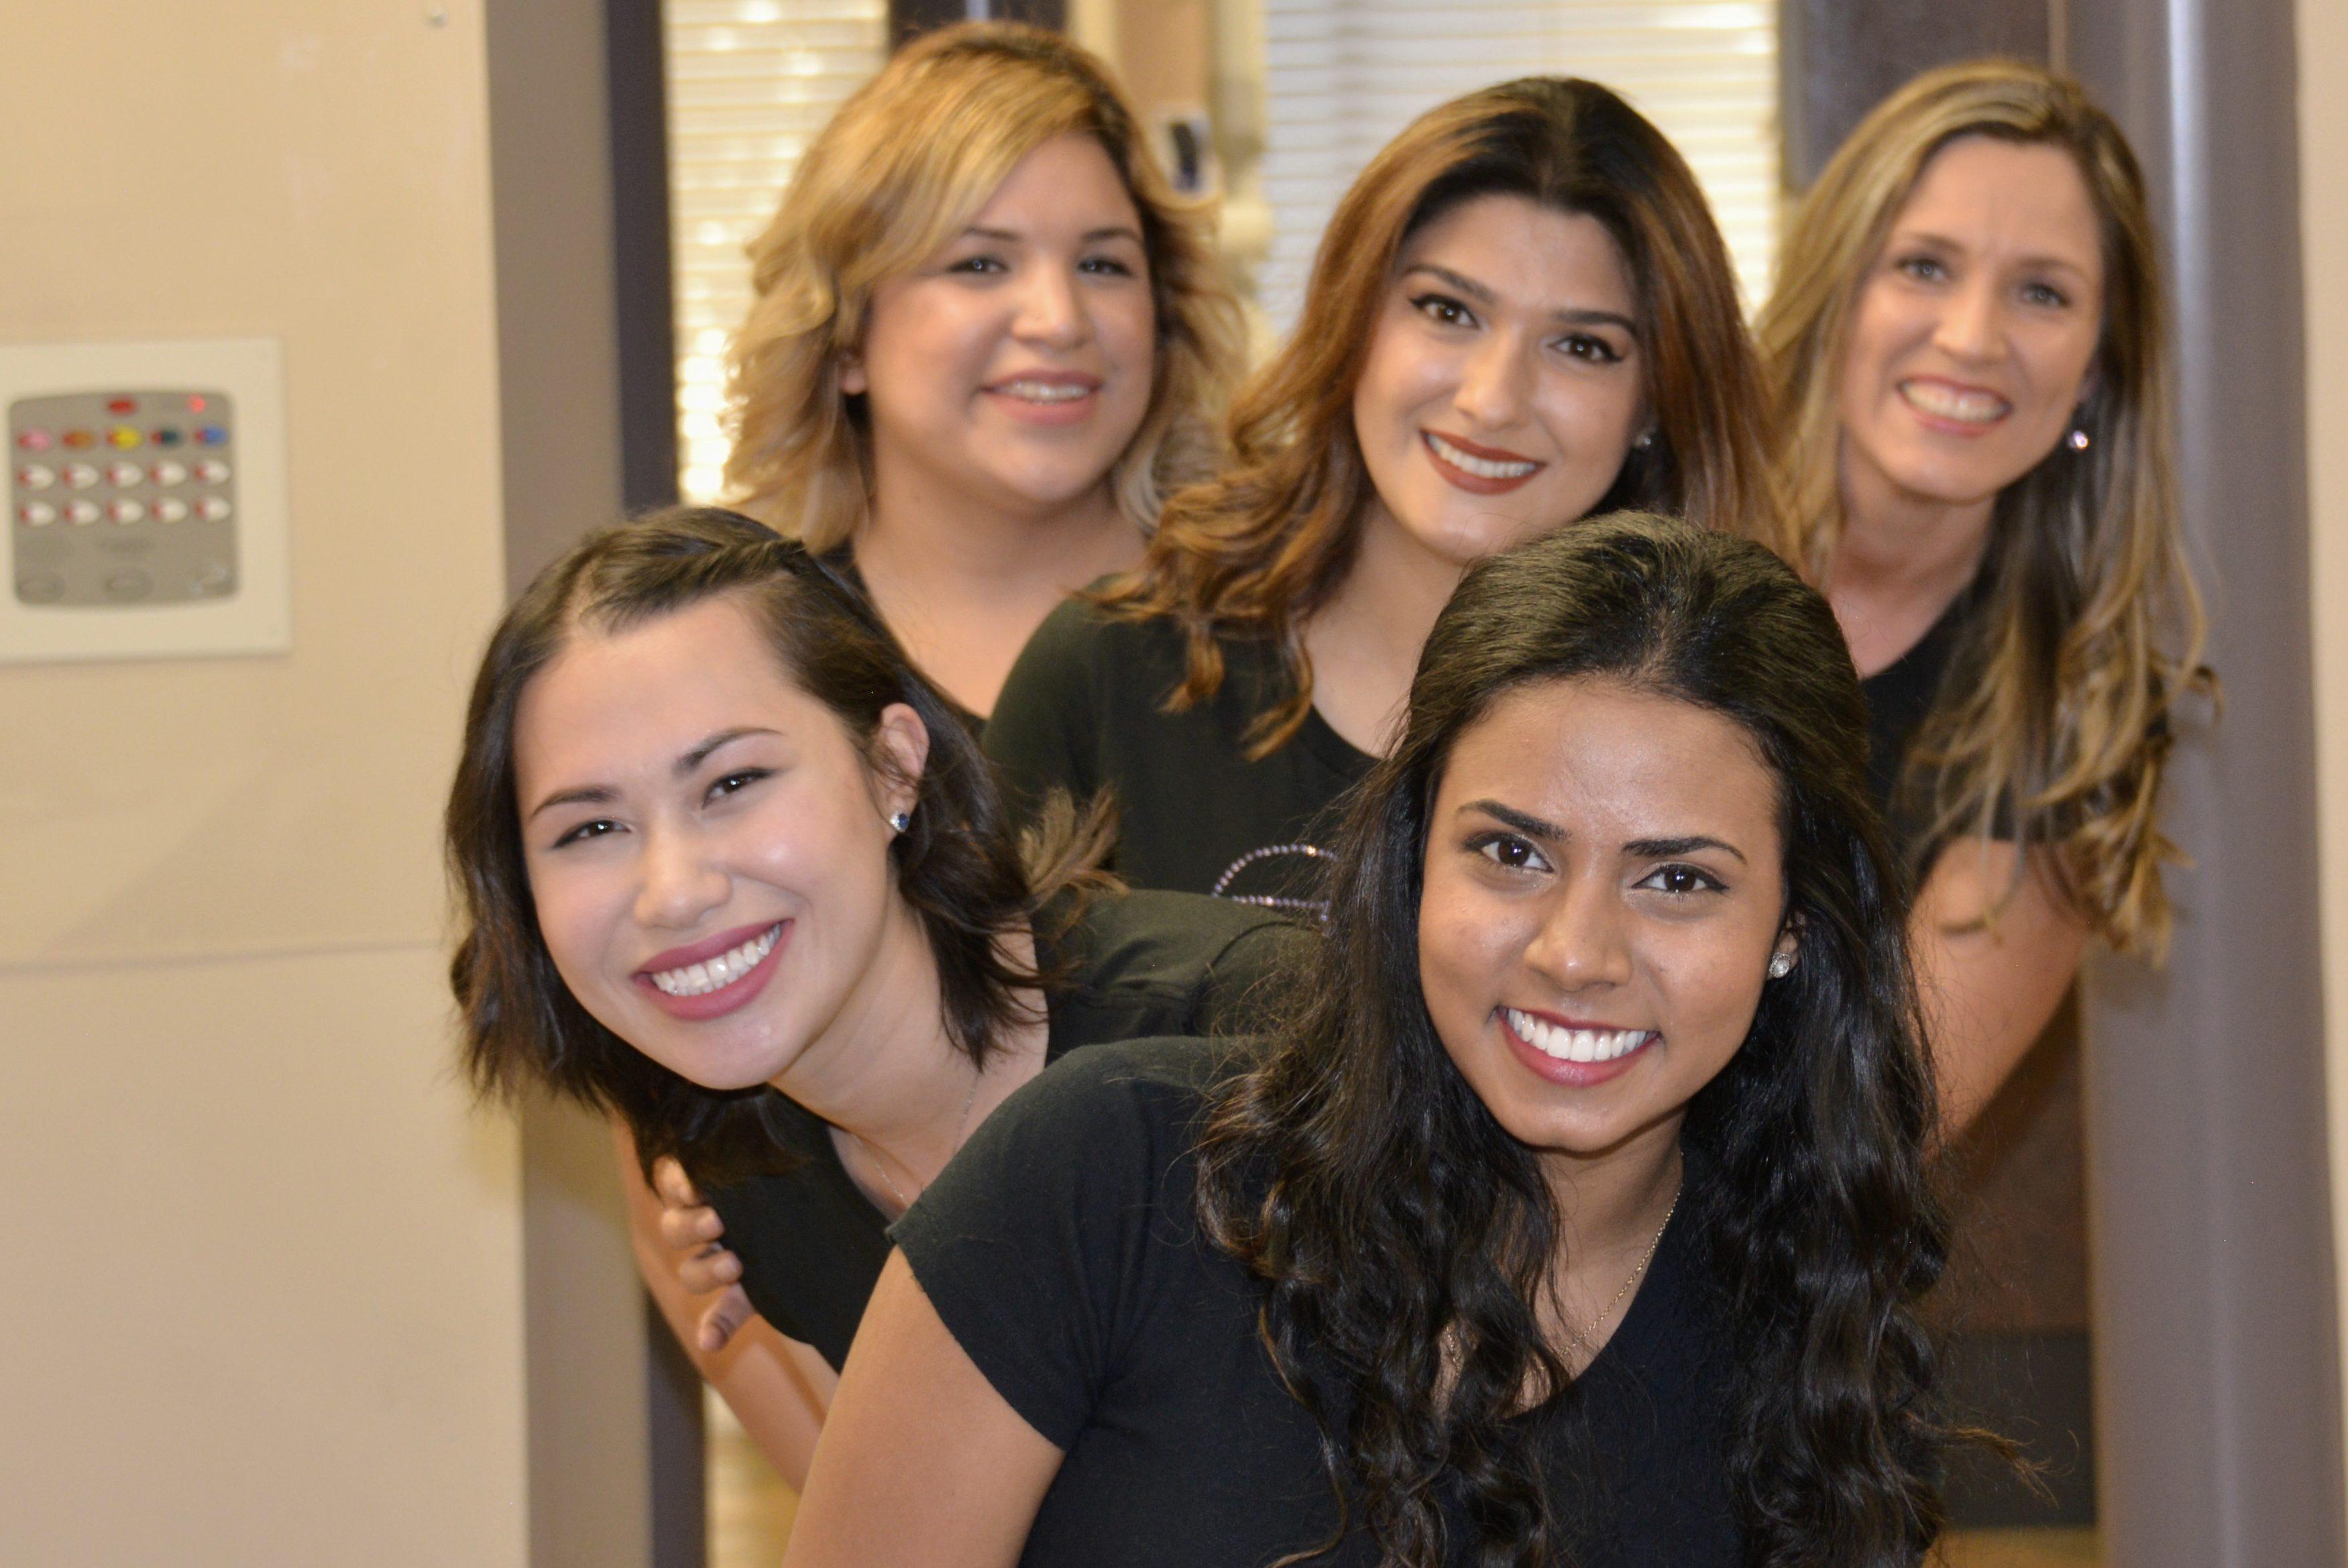 Sincere Smiles - Dental Practice Of Fatima Vafai DDS Inc